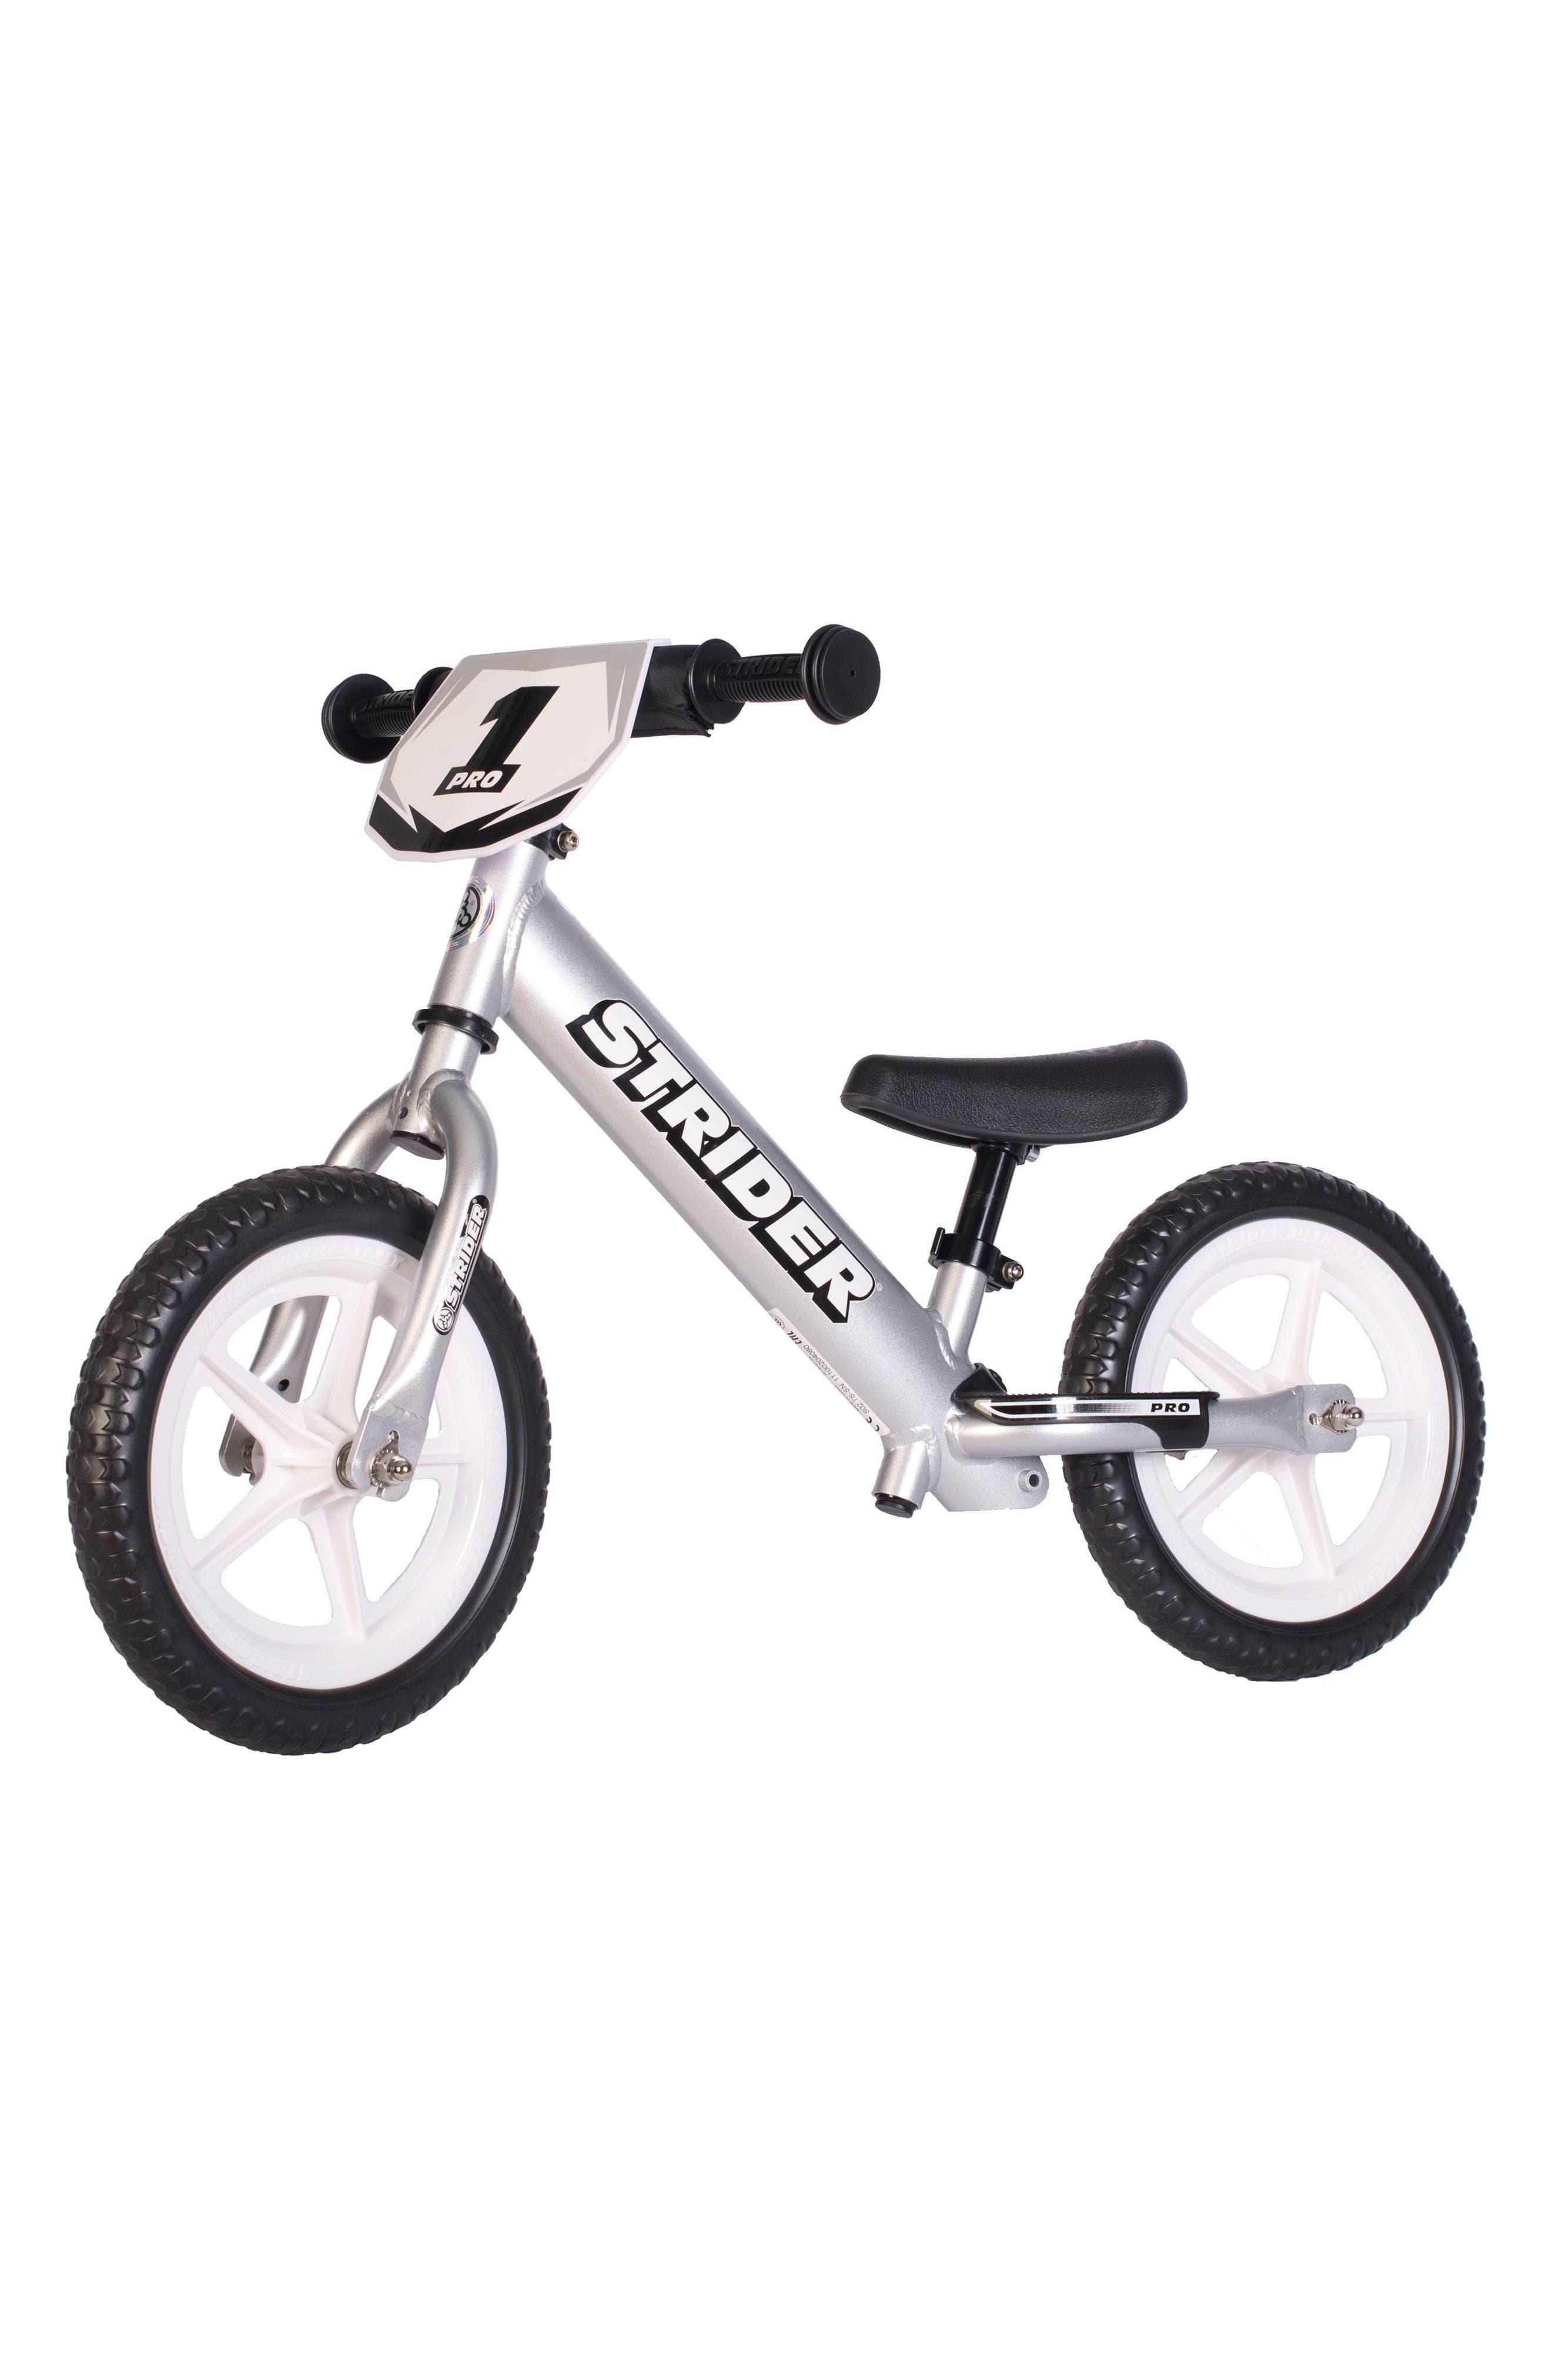 Alternate Image 1 Selected - STRIDER® 12 Pro Balance No Pedal Bike